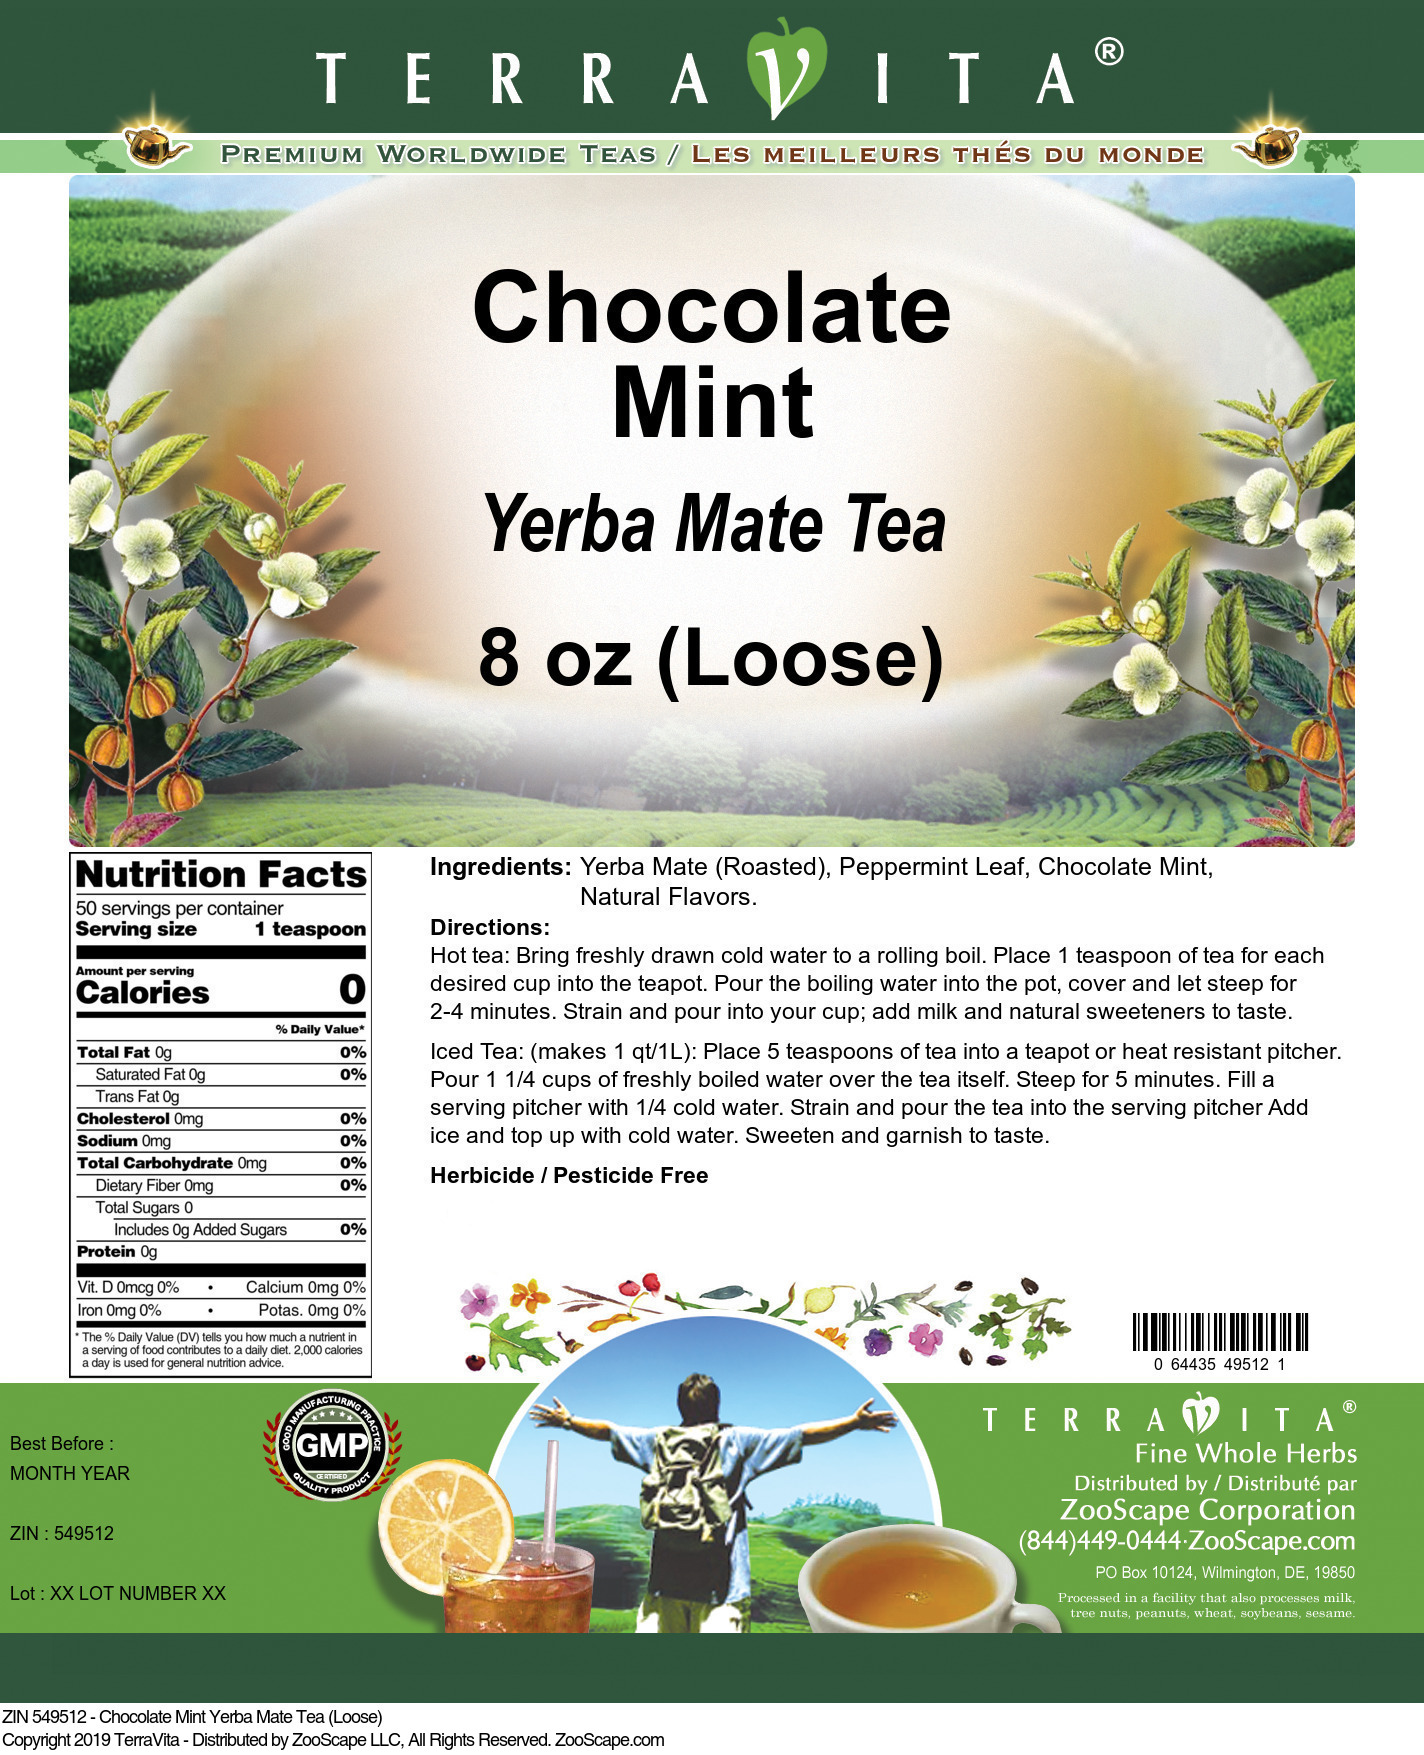 Chocolate Mint Yerba Mate Tea (Loose)